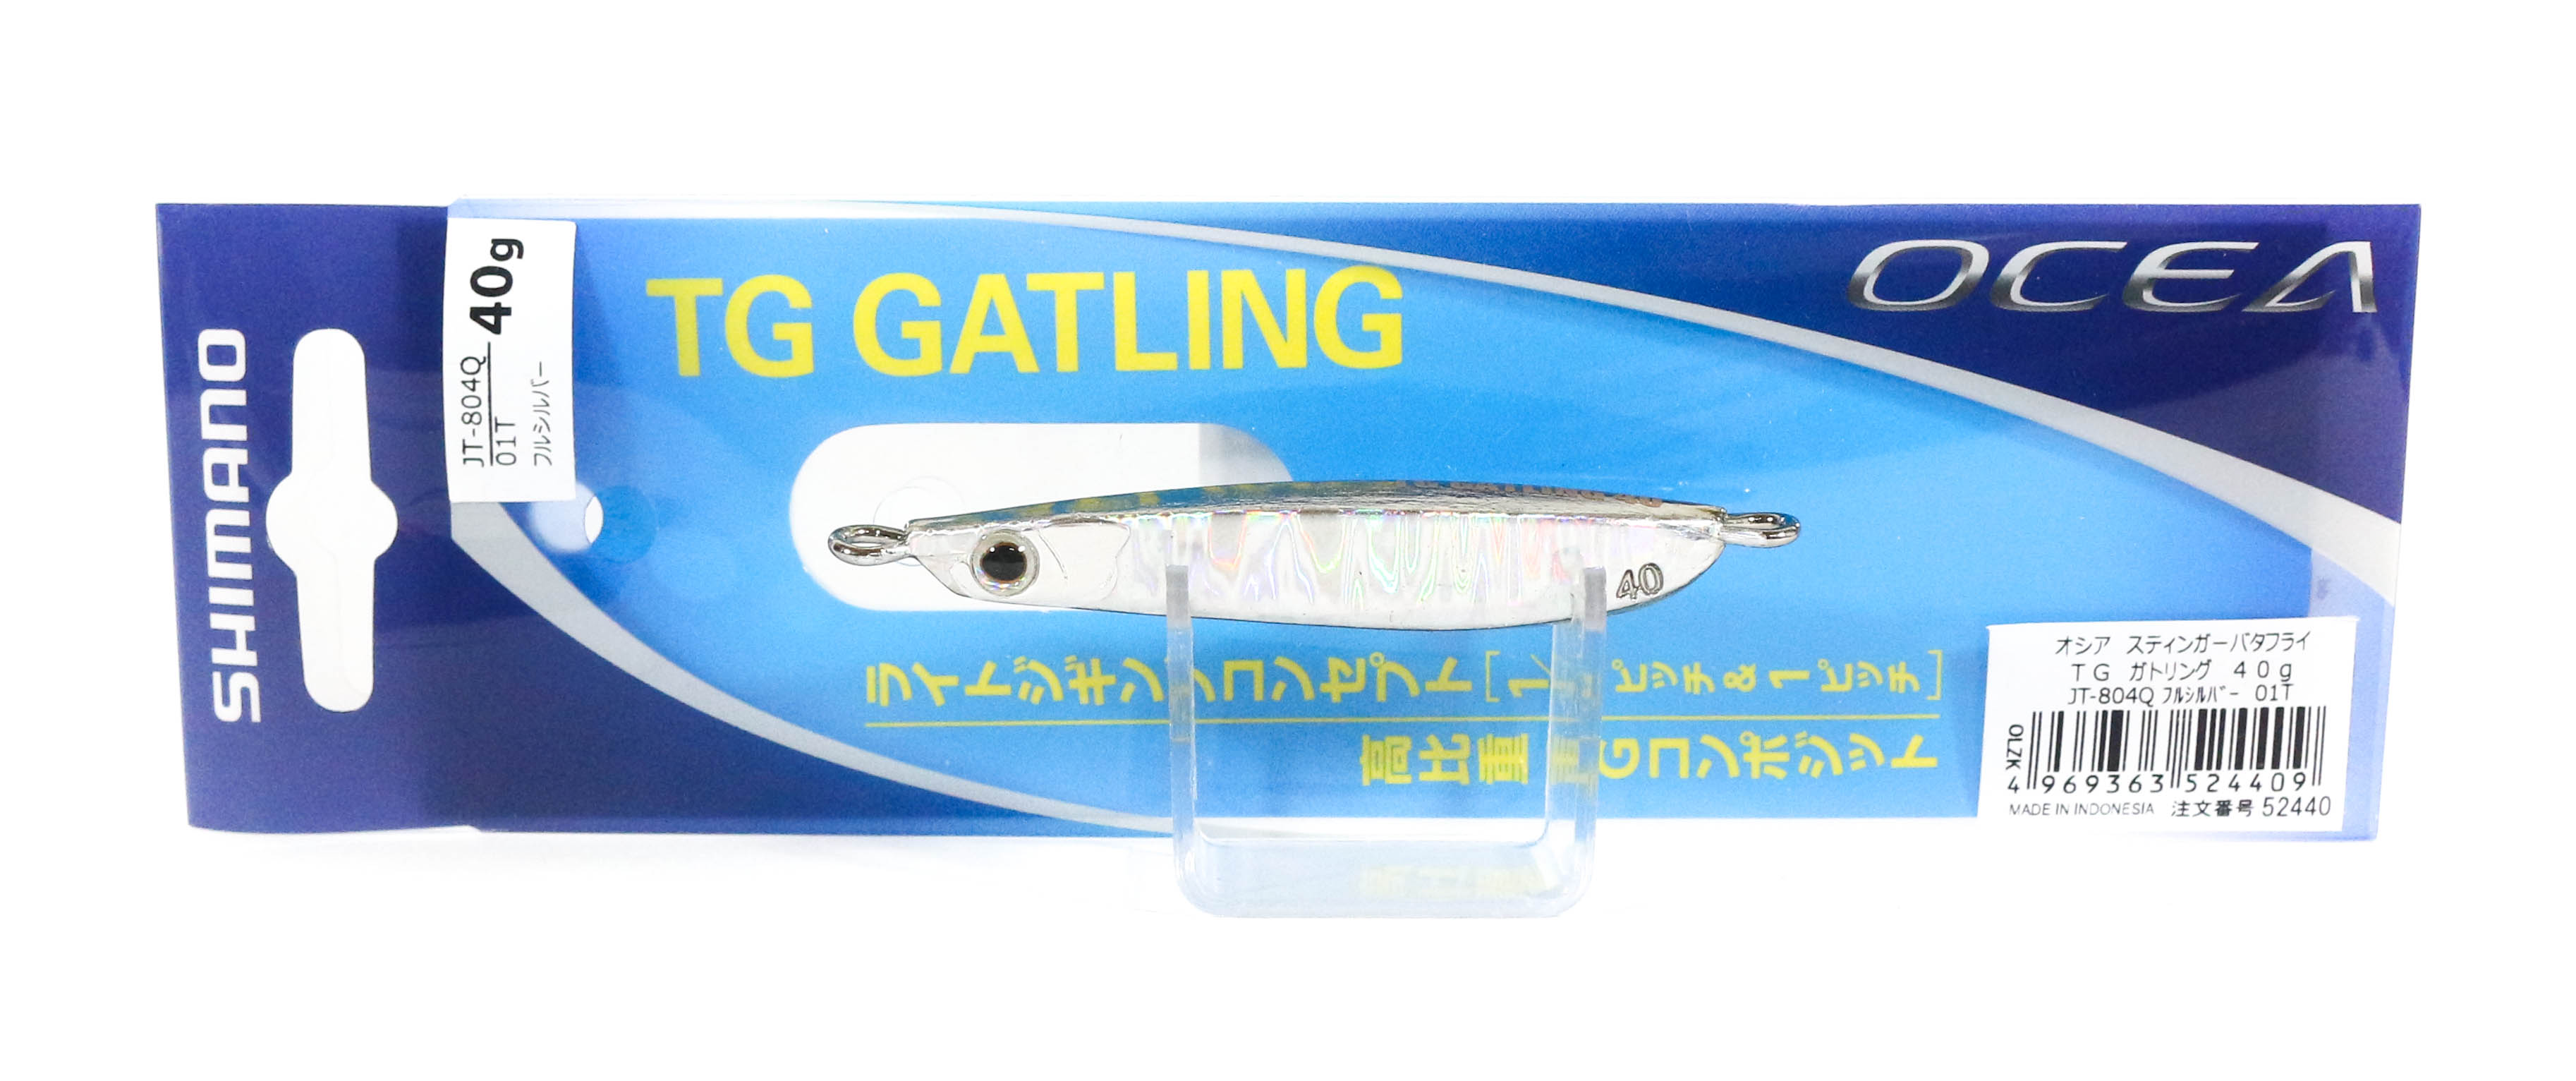 Shimano JT-804Q Metal Jig TG Gatling 40 grams 01T 524409